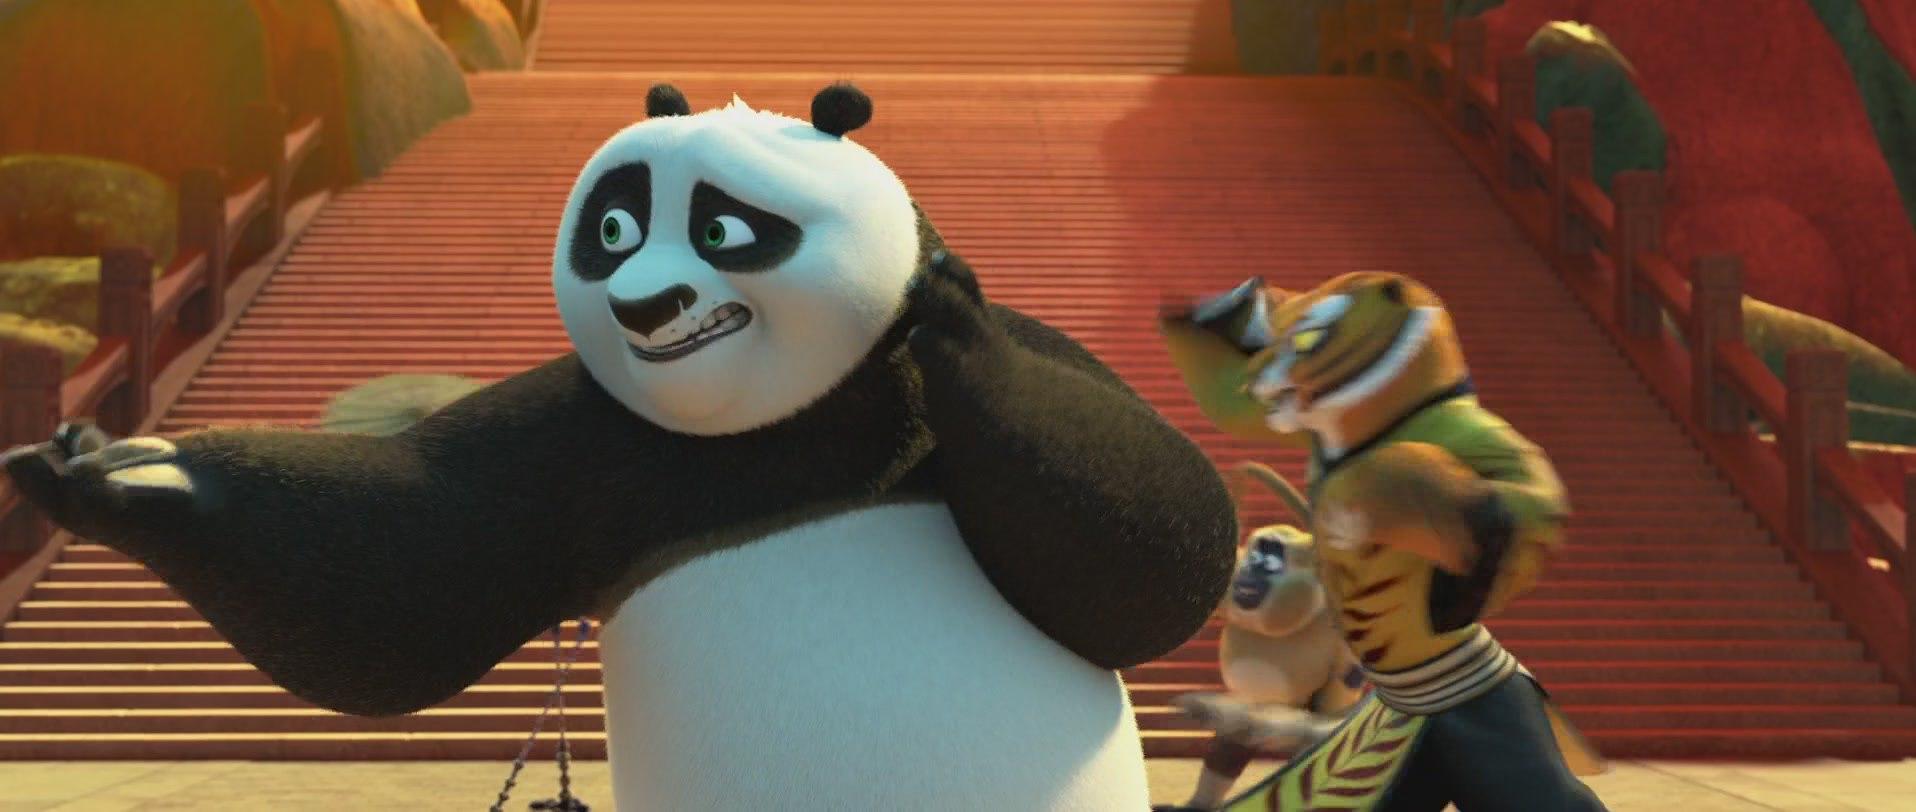 панда кунг-фу на тренировке